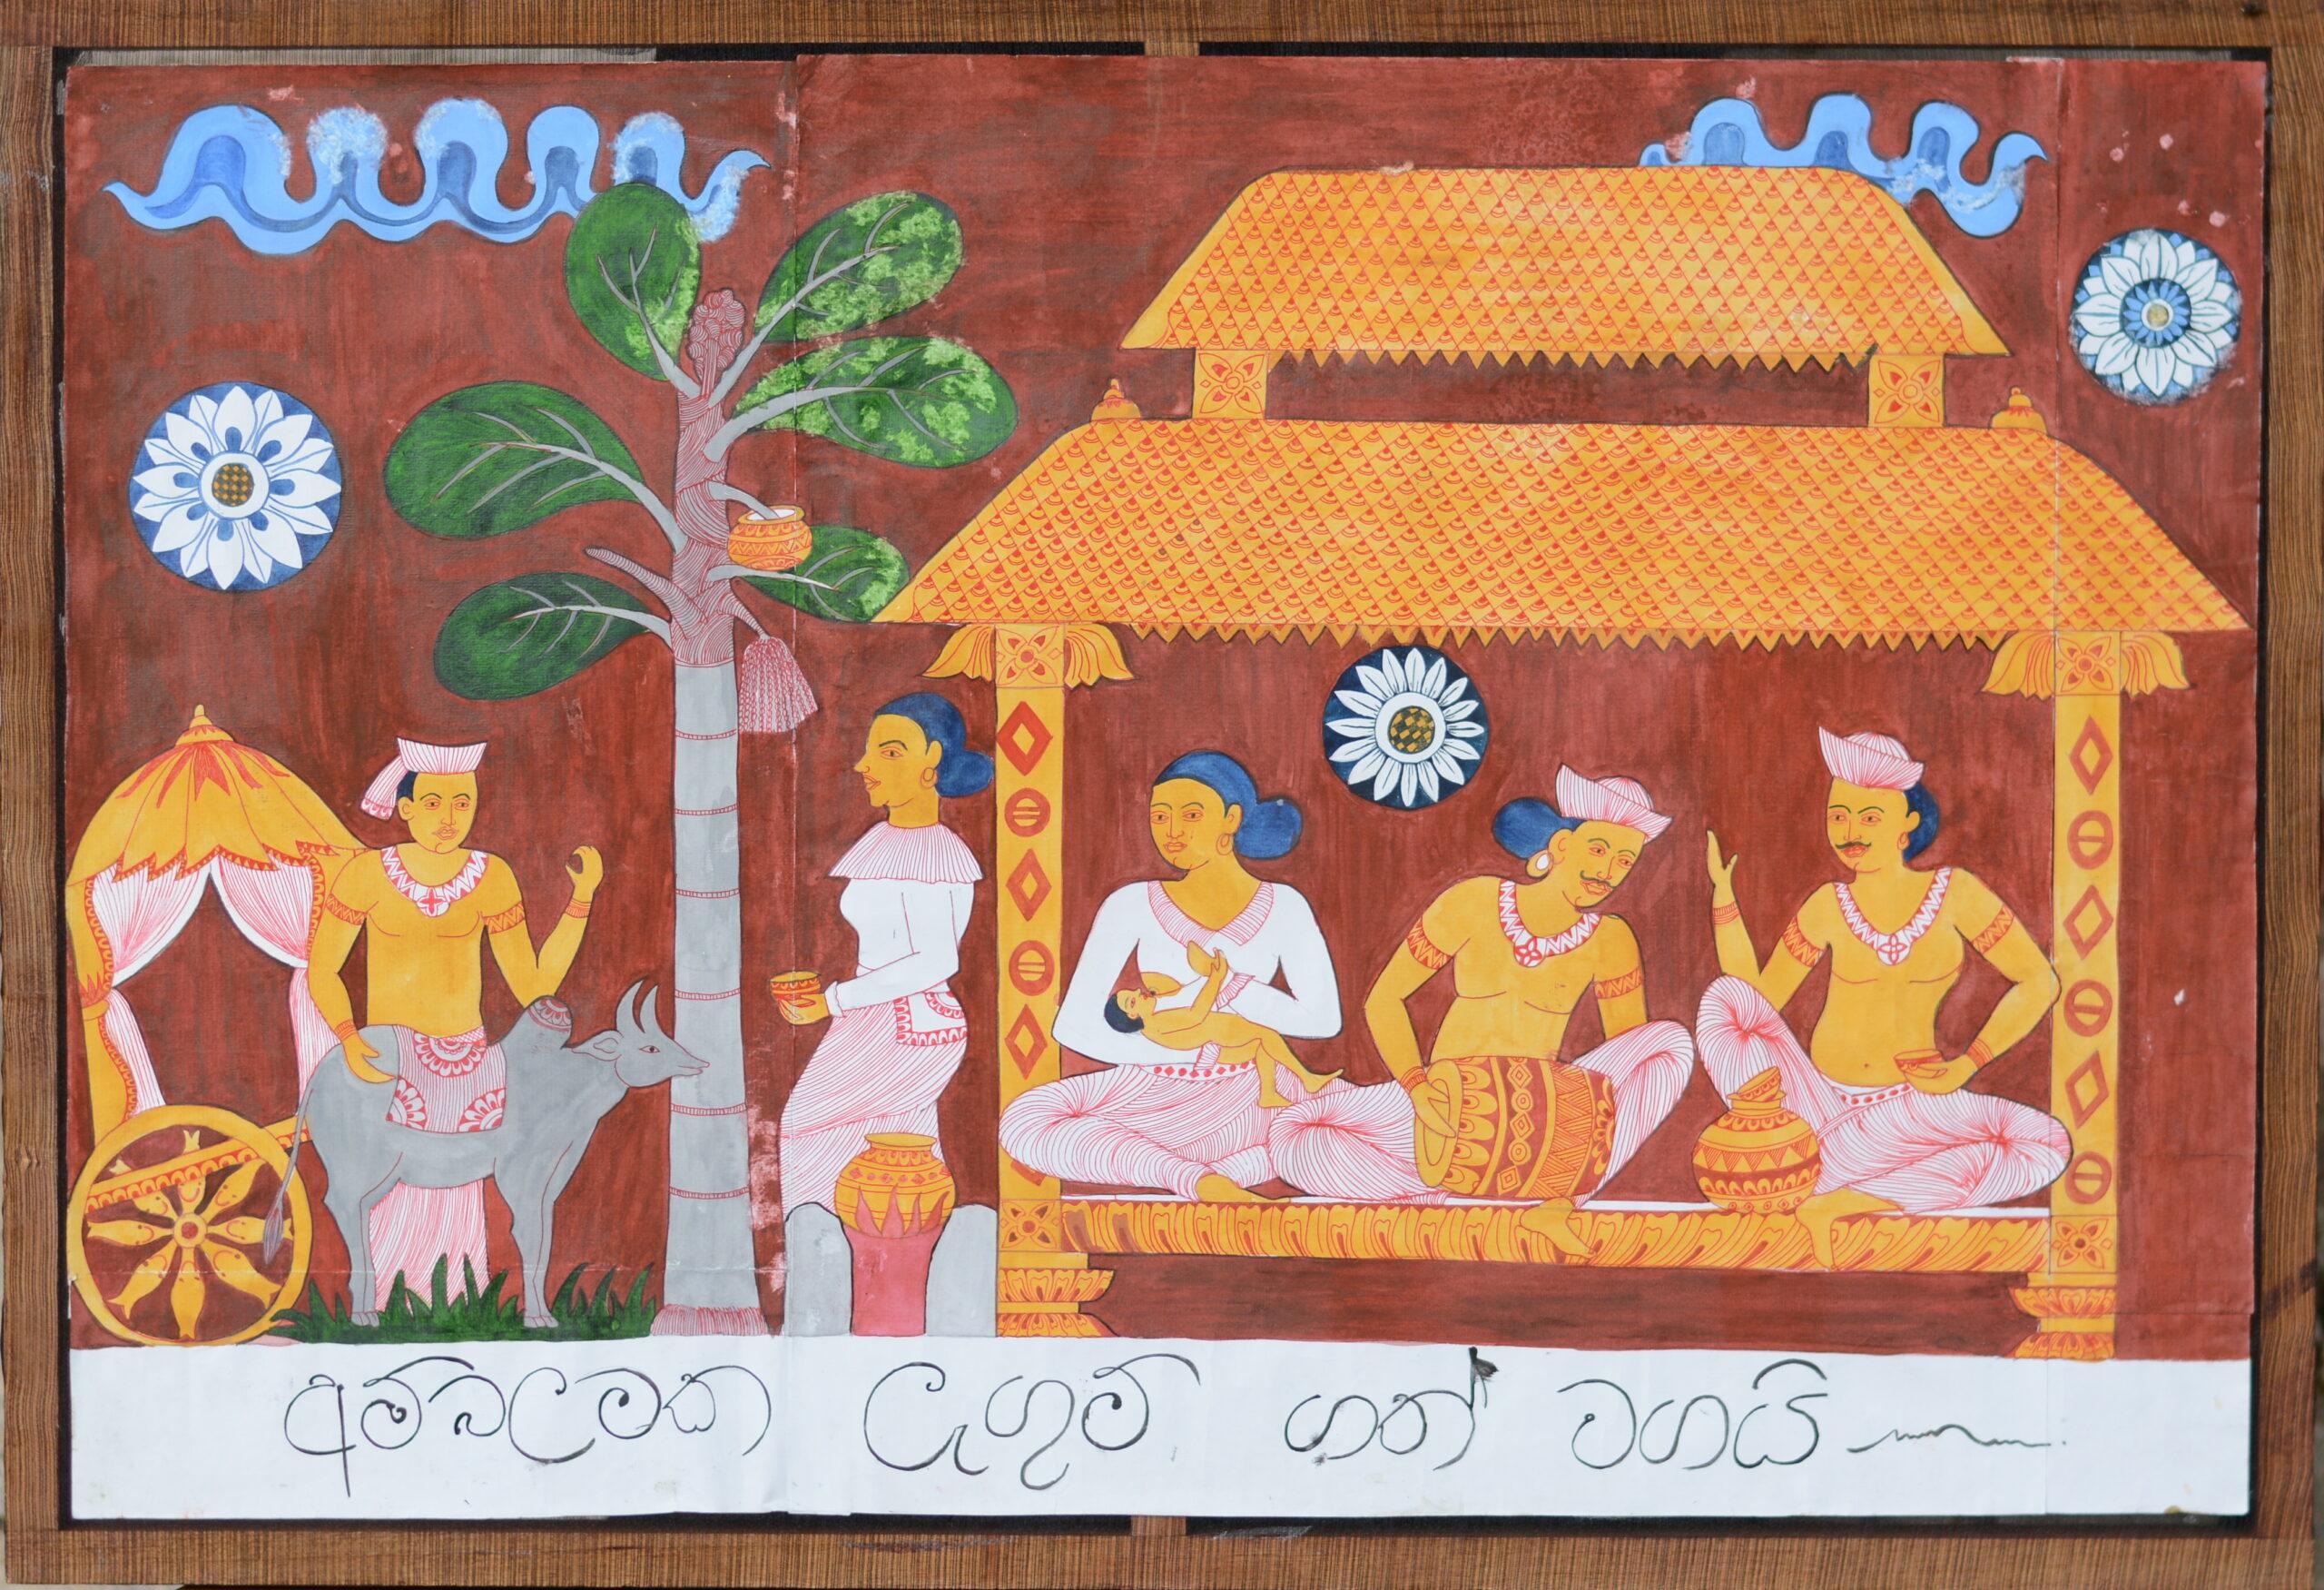 A small break in a leisure Lounge_J. M. Lakshika Nadeeshani Jayaweera